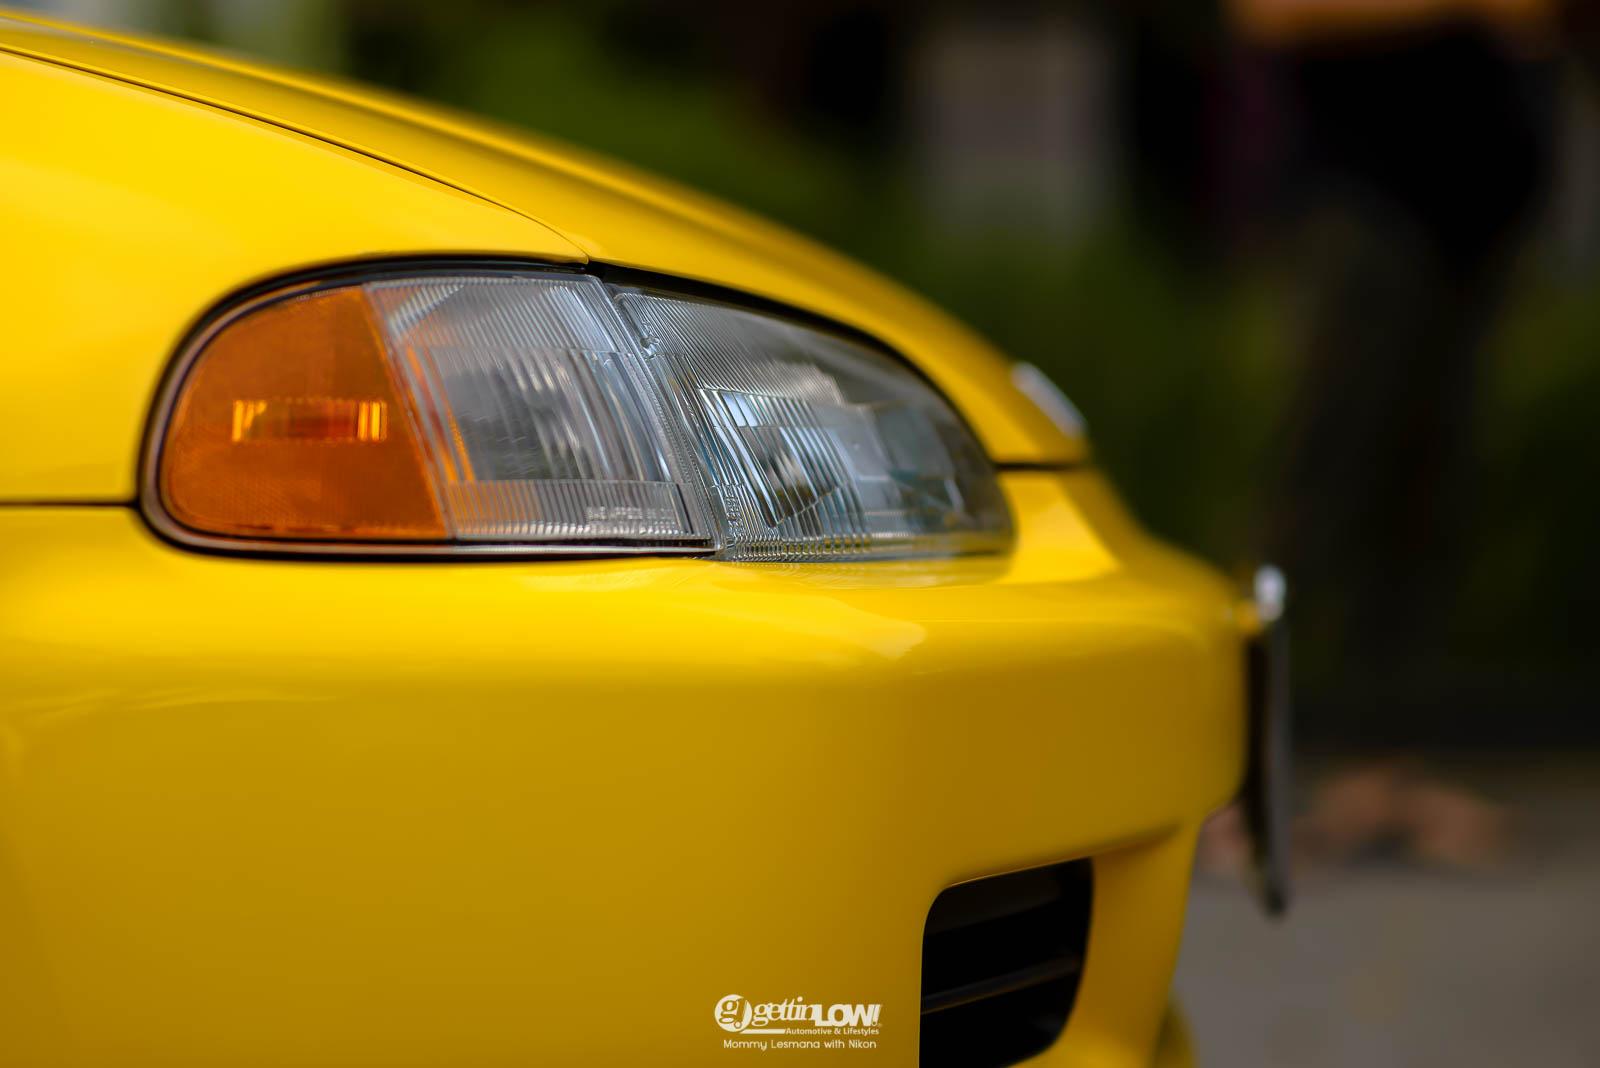 Franklin Honda Civic Estilo